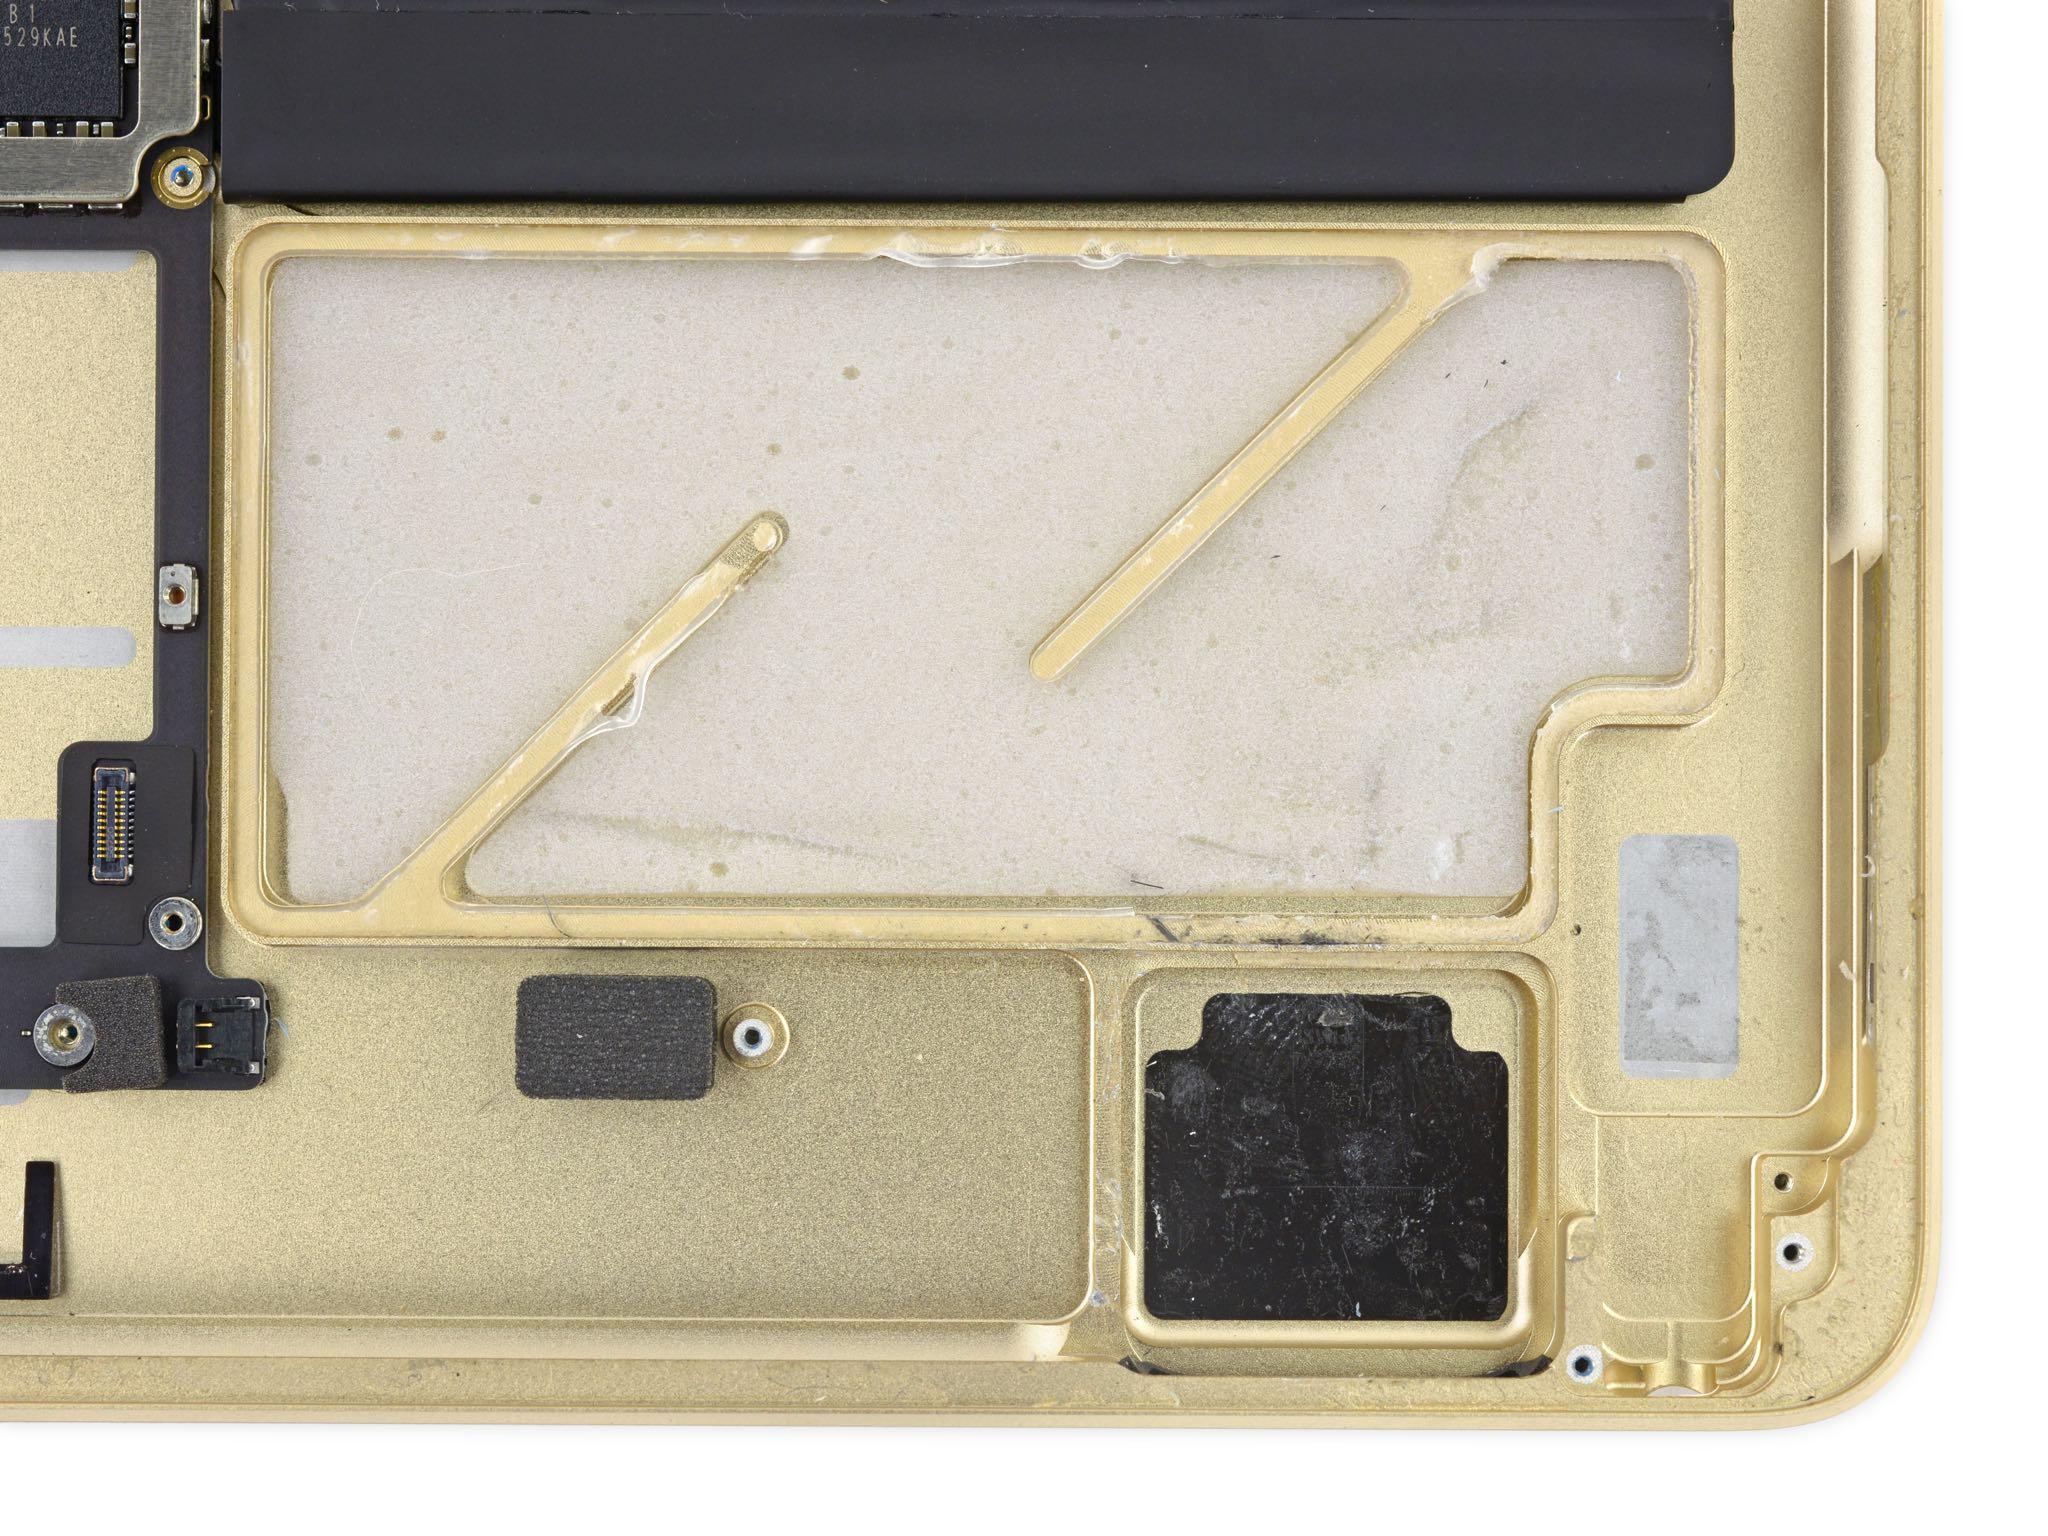 iPad Pro iFixit teardown 003